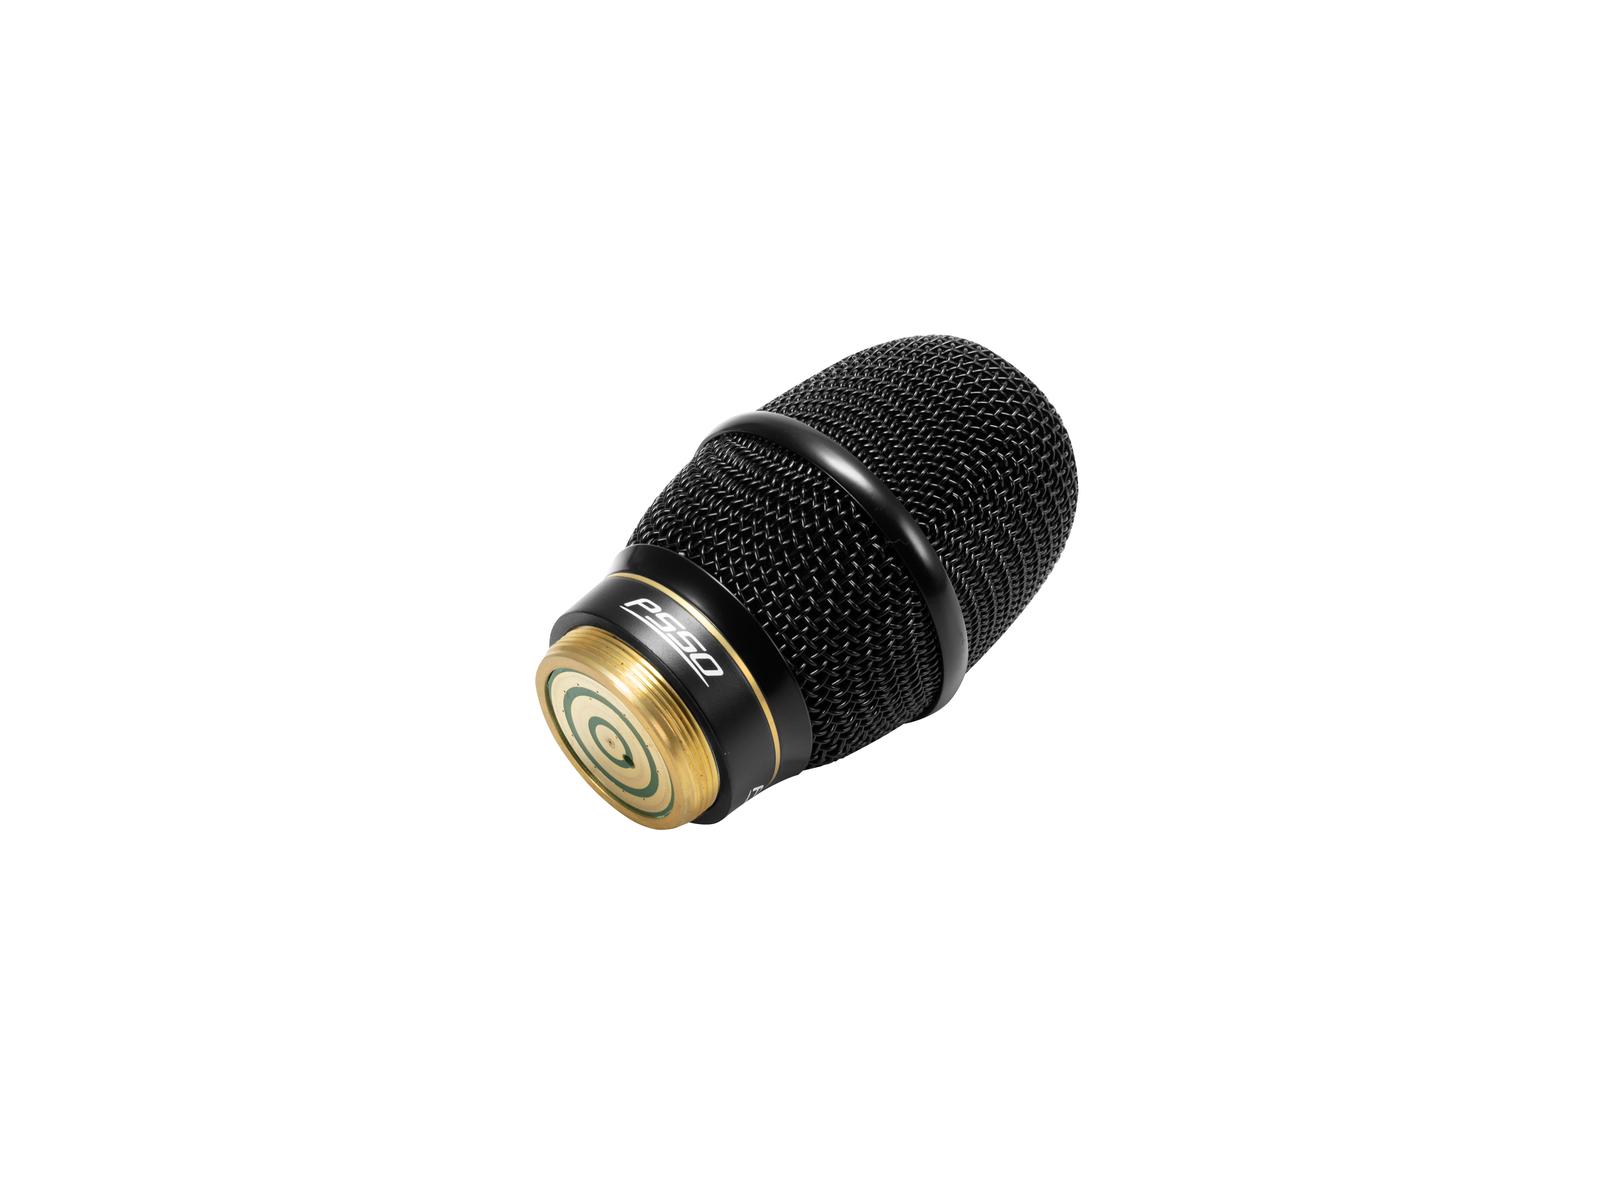 PSSO WISE Kondensatorkapsel für Funkmikrofon